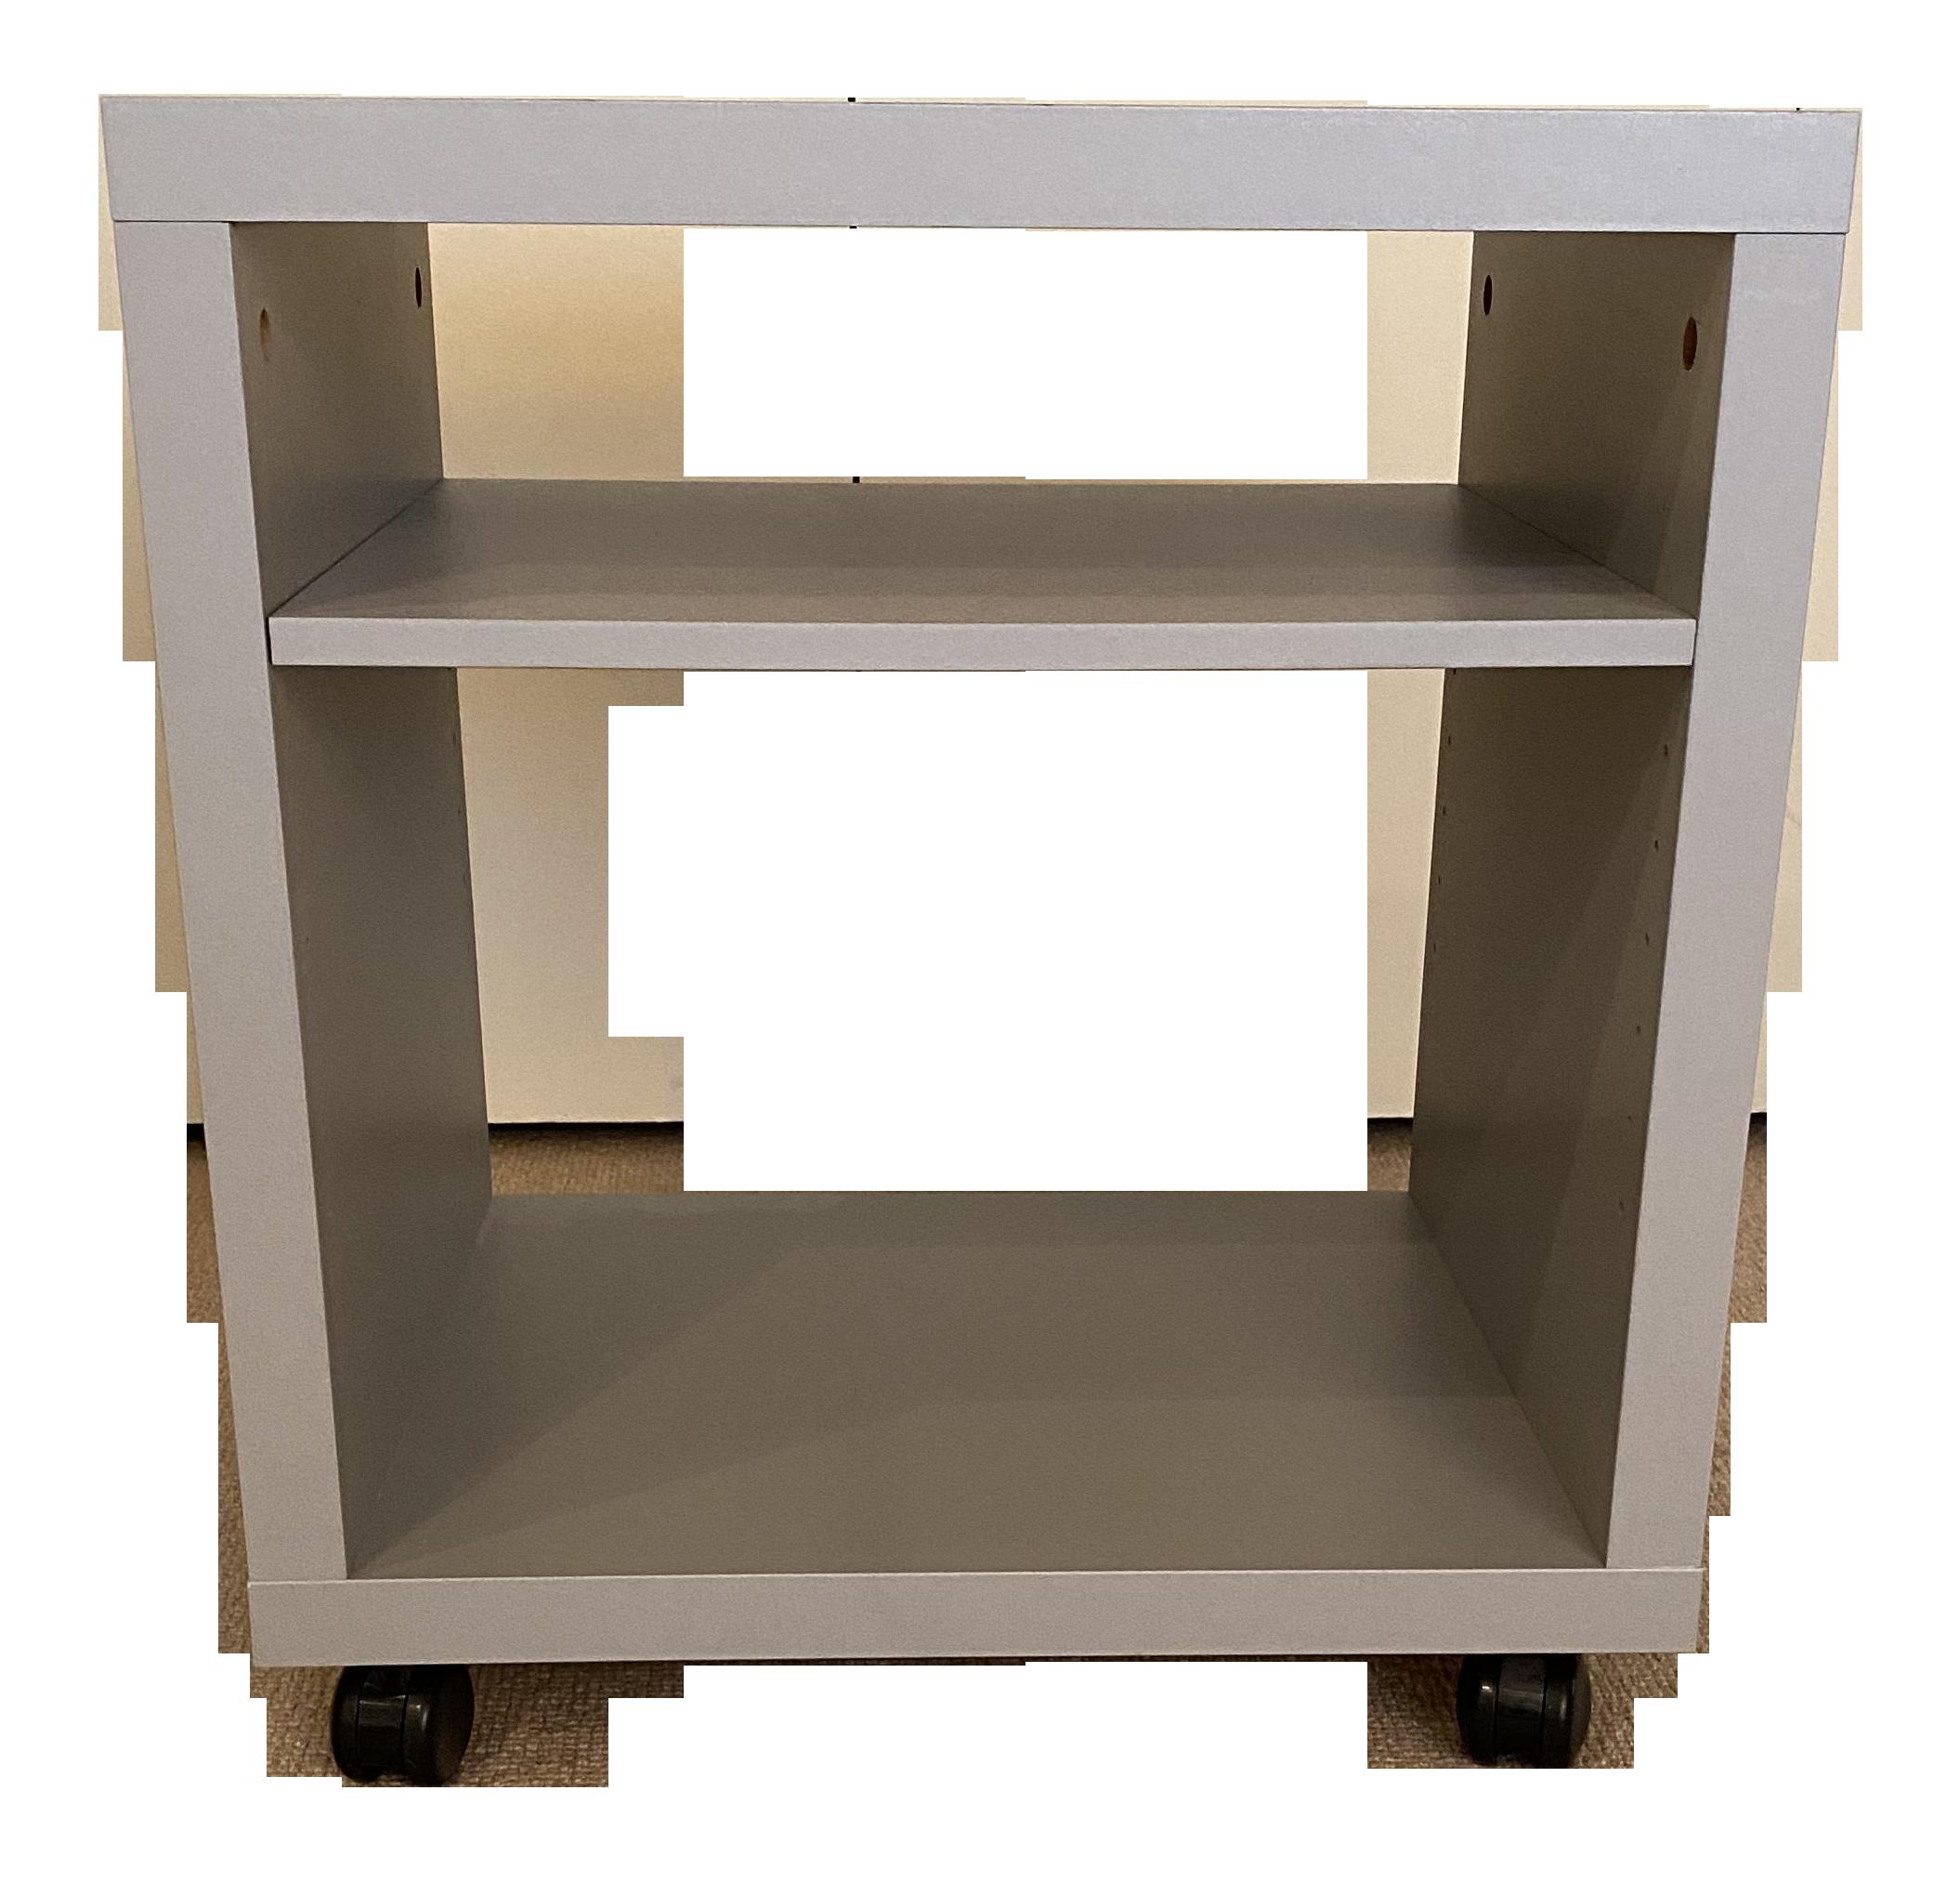 1980s Cube Storage Cabinet Or Nightstand Chairish